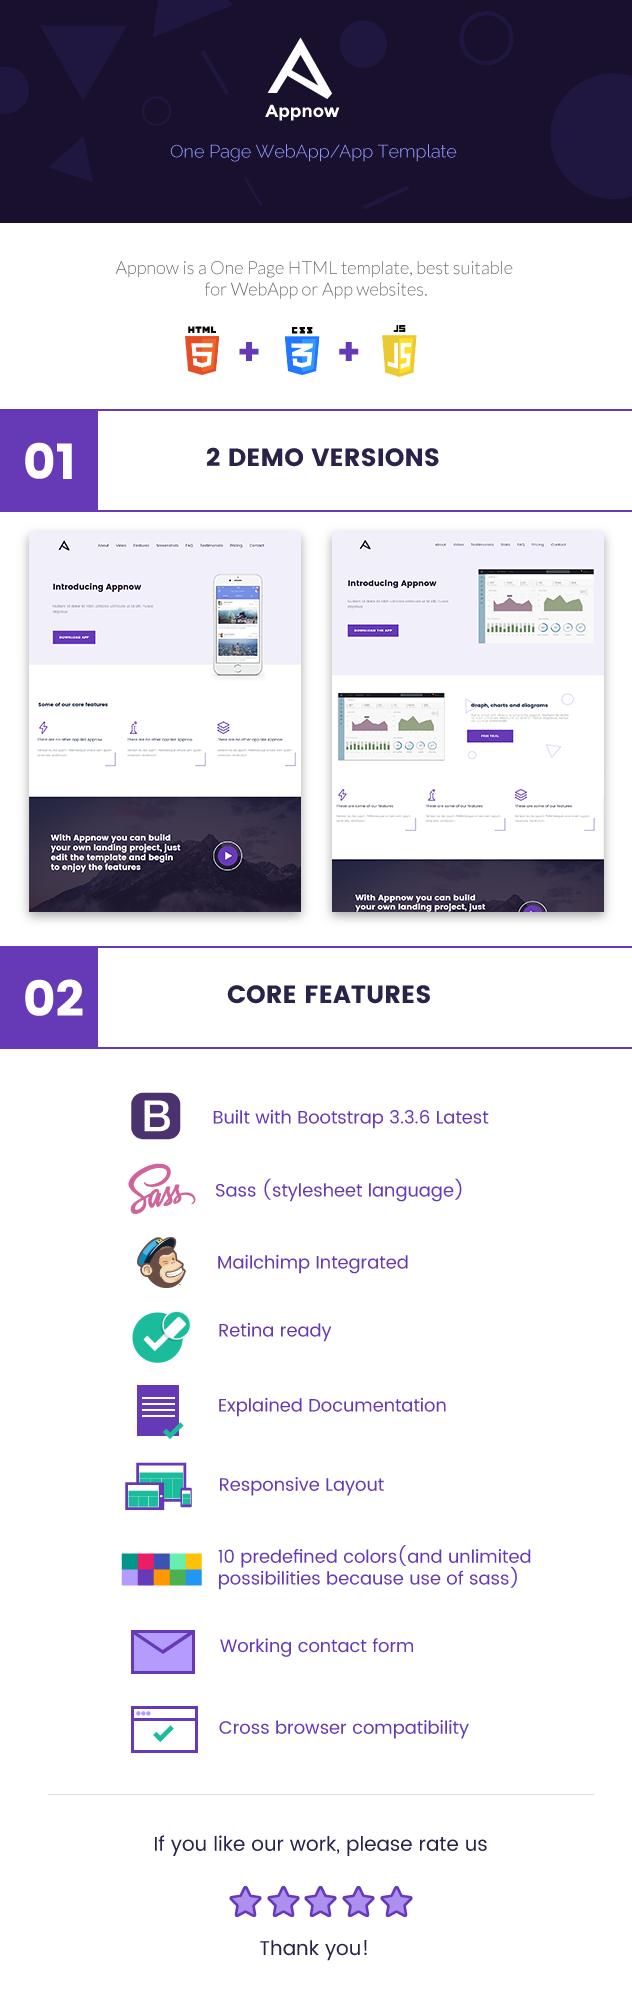 Appnow - One Page WebApp-App HTML Template - 1